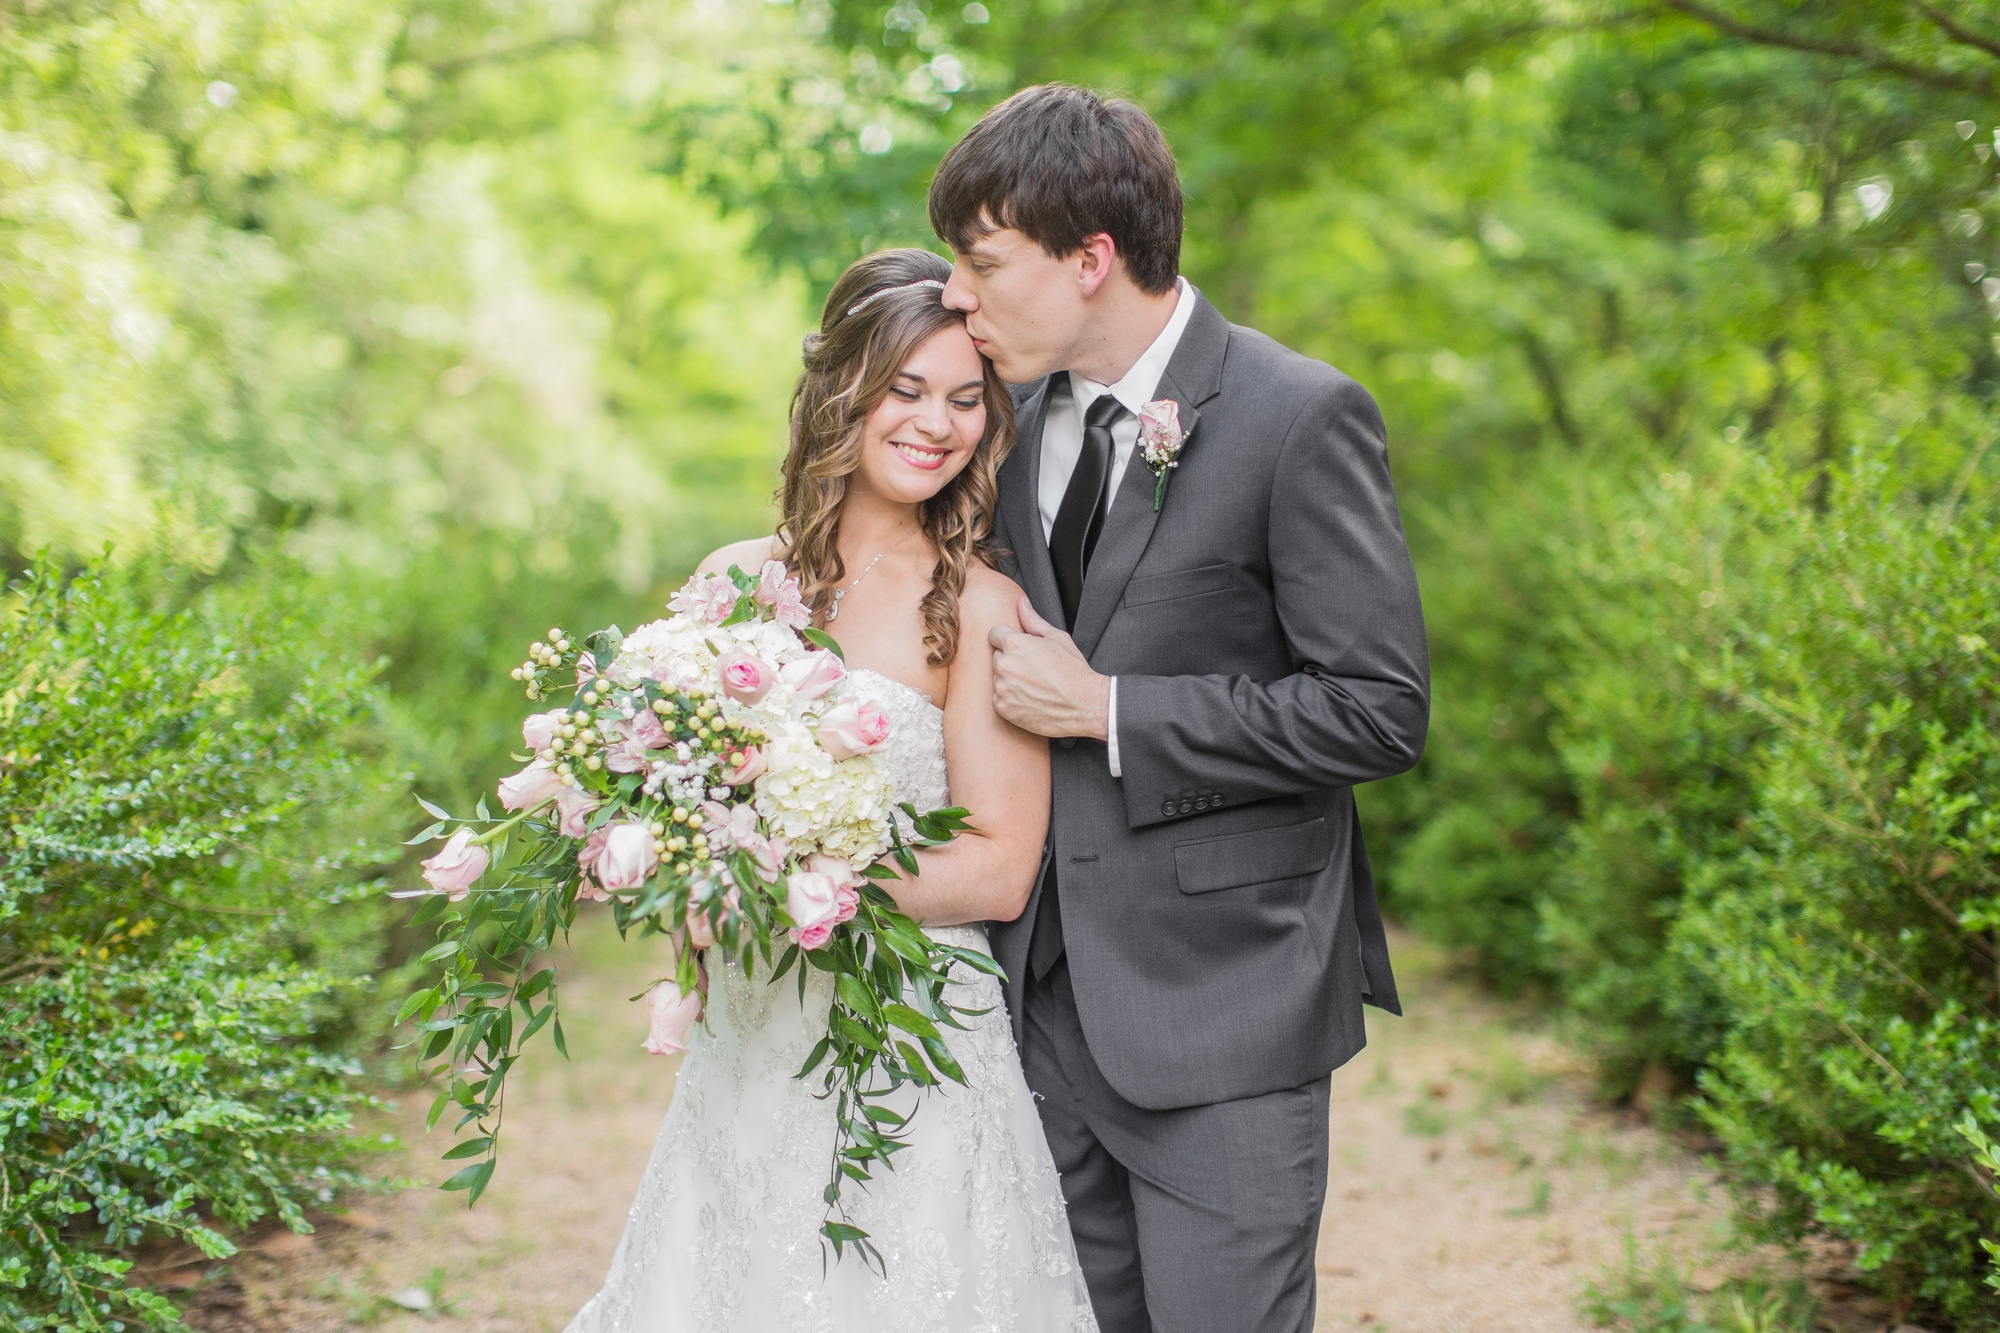 hendersonwedding-161.jpg